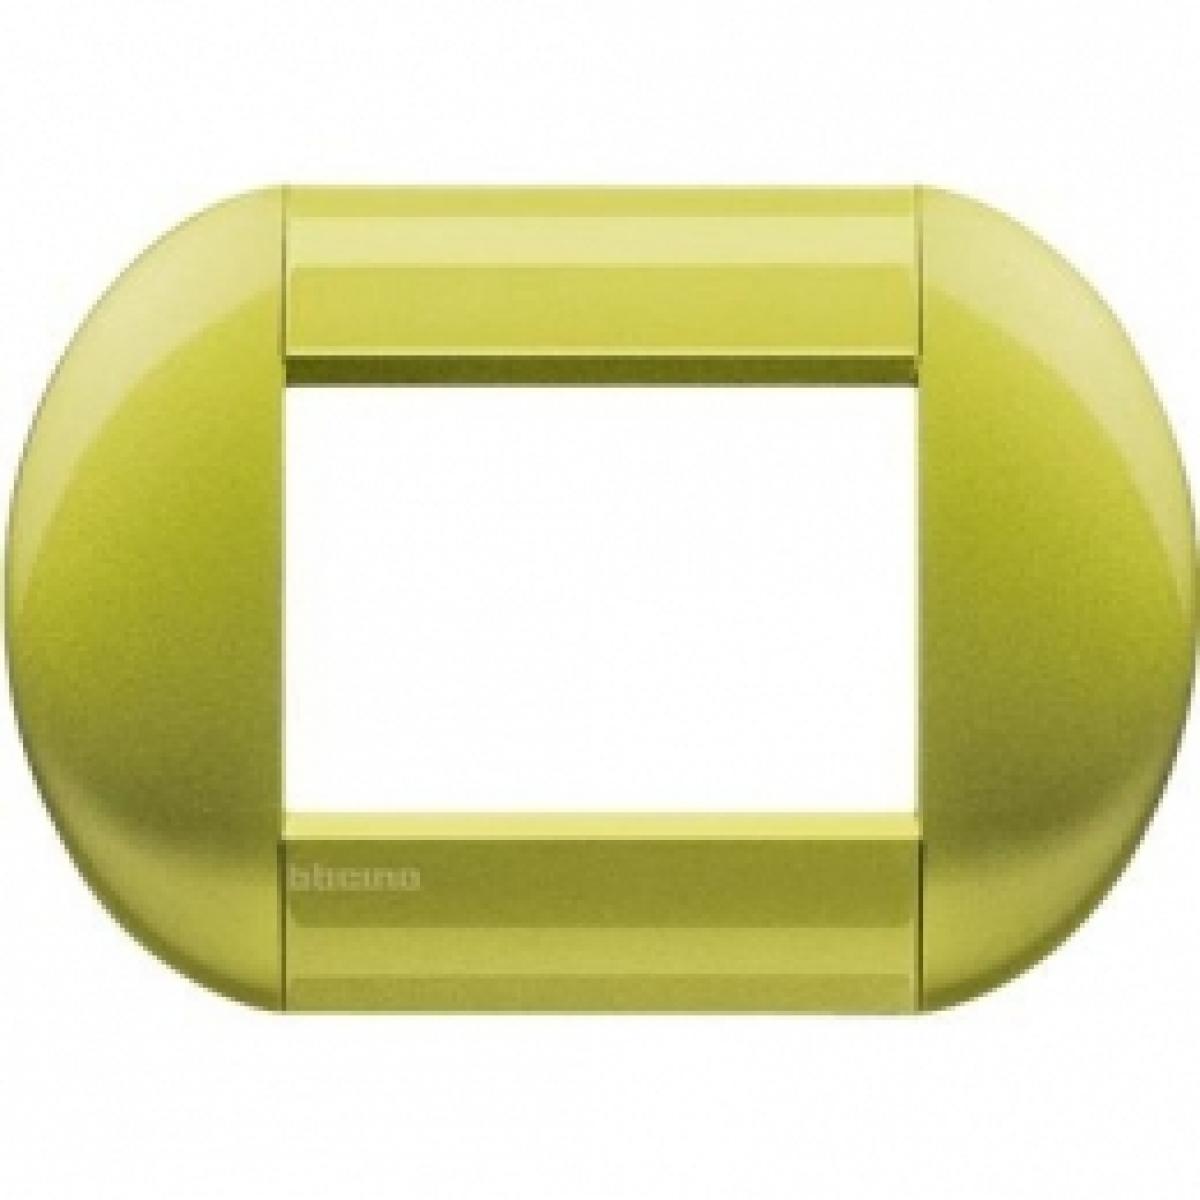 Placca Tonda 3 Moduli Citron Bticino Living International LNB4803CT